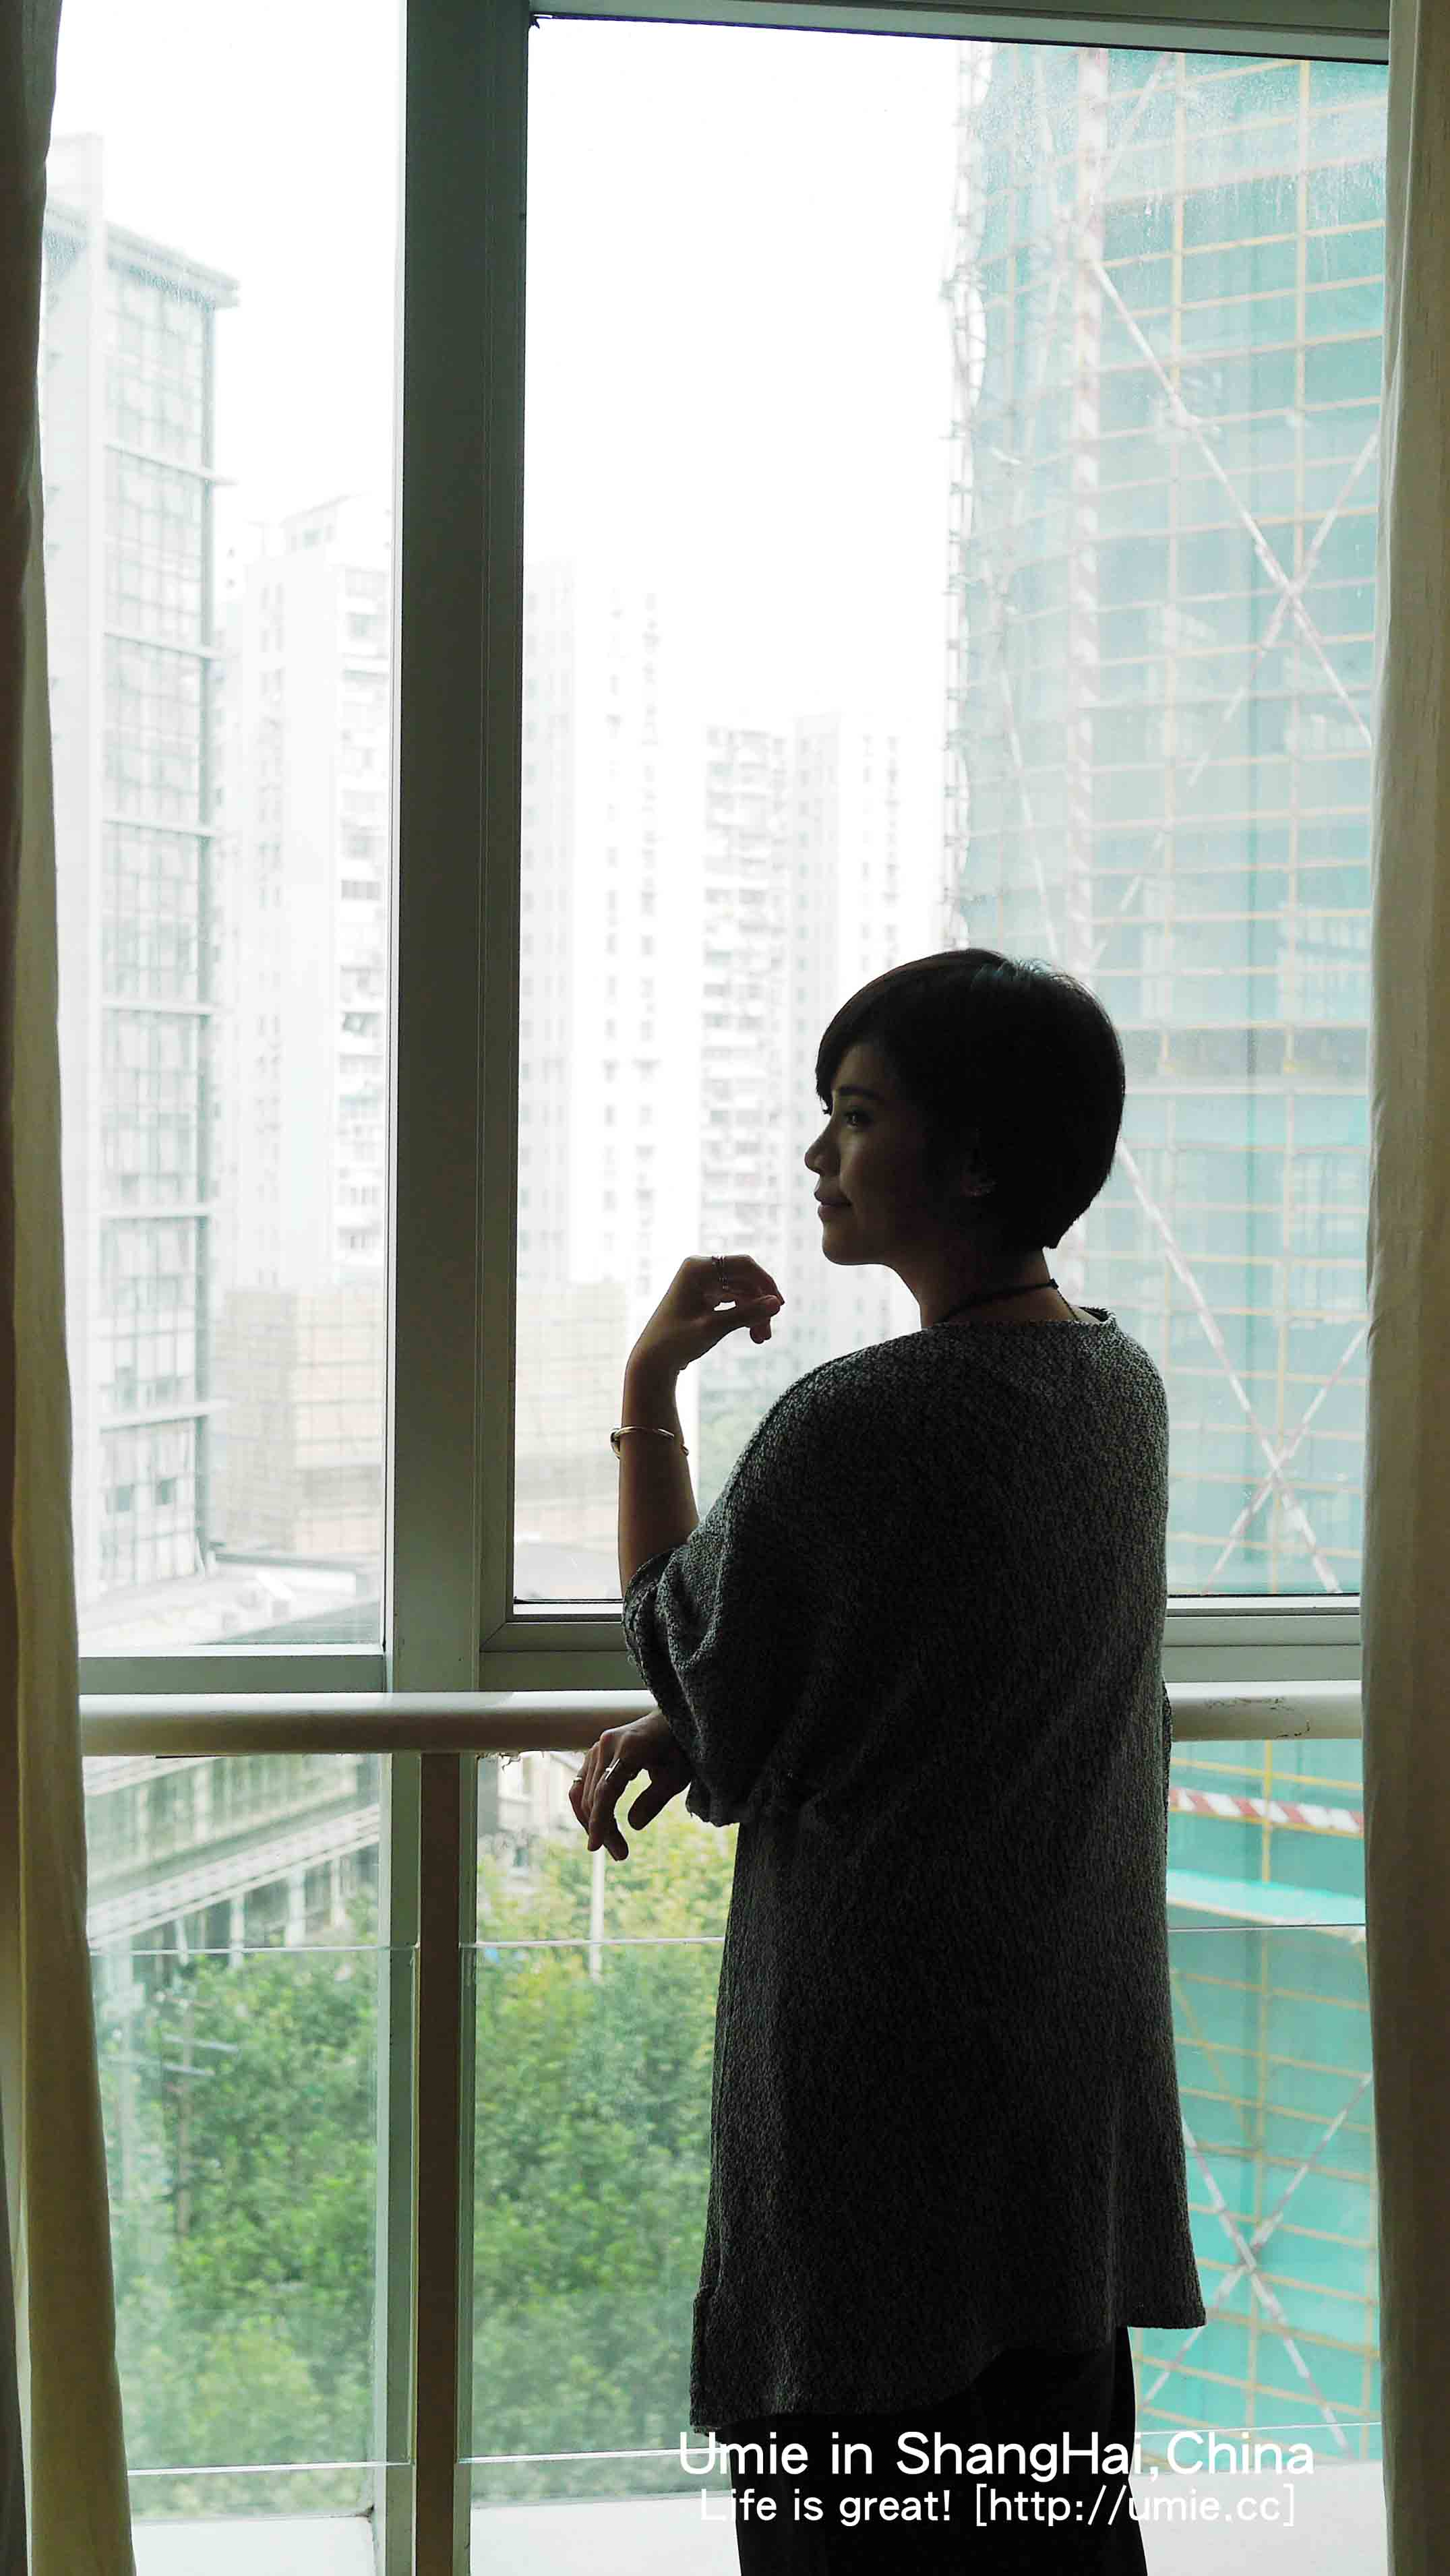 P中國上海住宿推薦-便宜住宿 / 近市區 / 近購物商城 / 附早餐自助吧-靜安區吉臣酒店(Ambassador Hotel)房間設施分享 :)